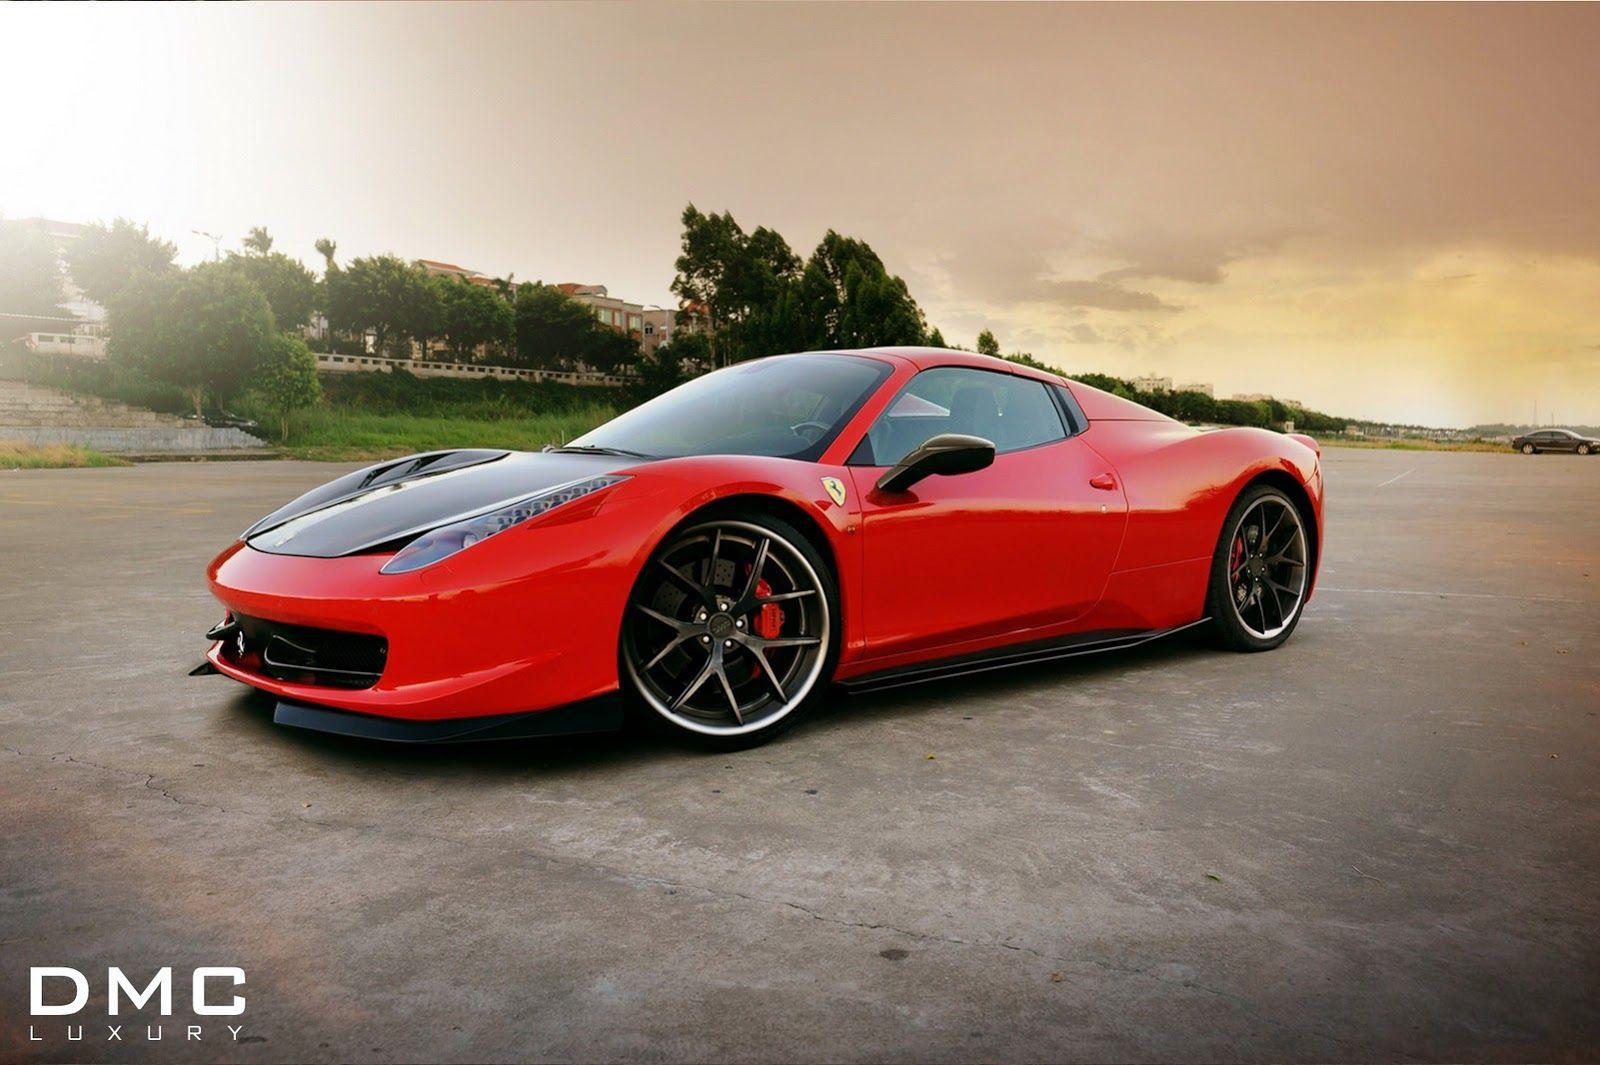 Dmc S New Ferrari 458 Spider Custom Tune Looks Red Hot With